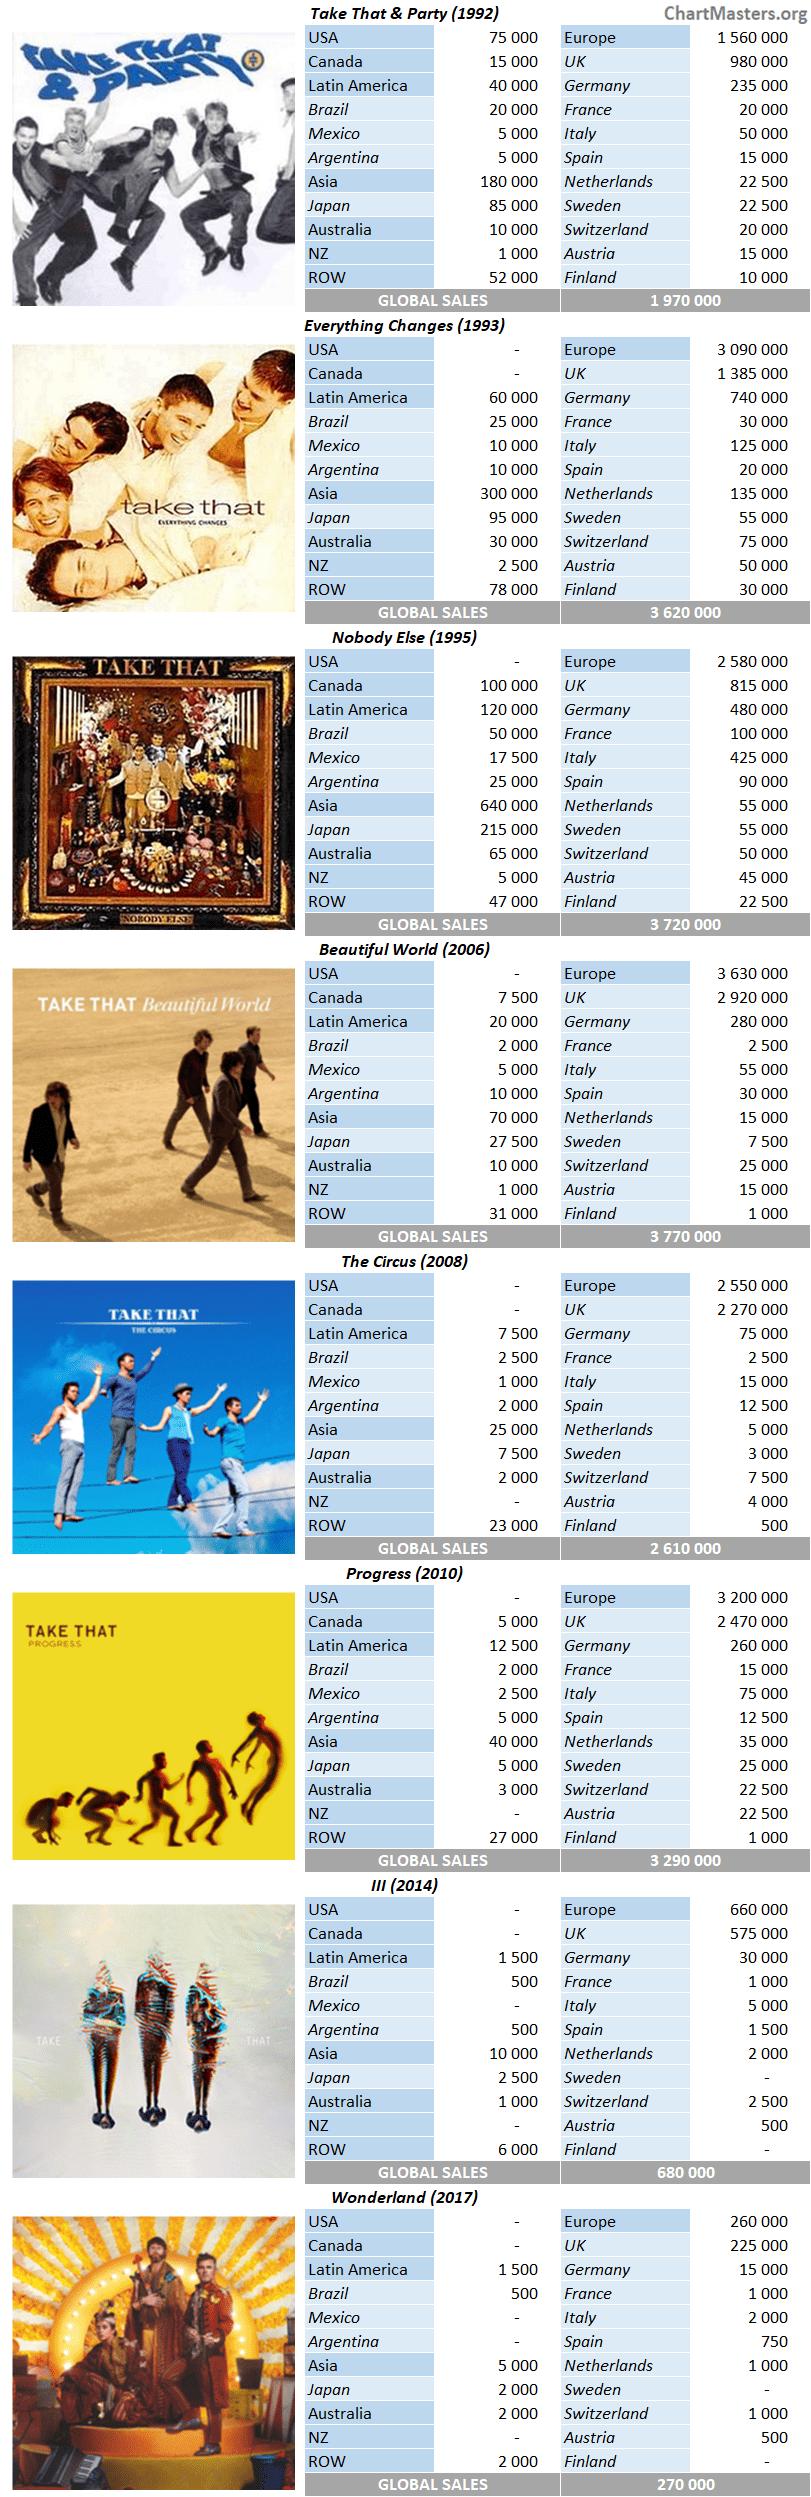 CSPC Take That album sales breakdowns